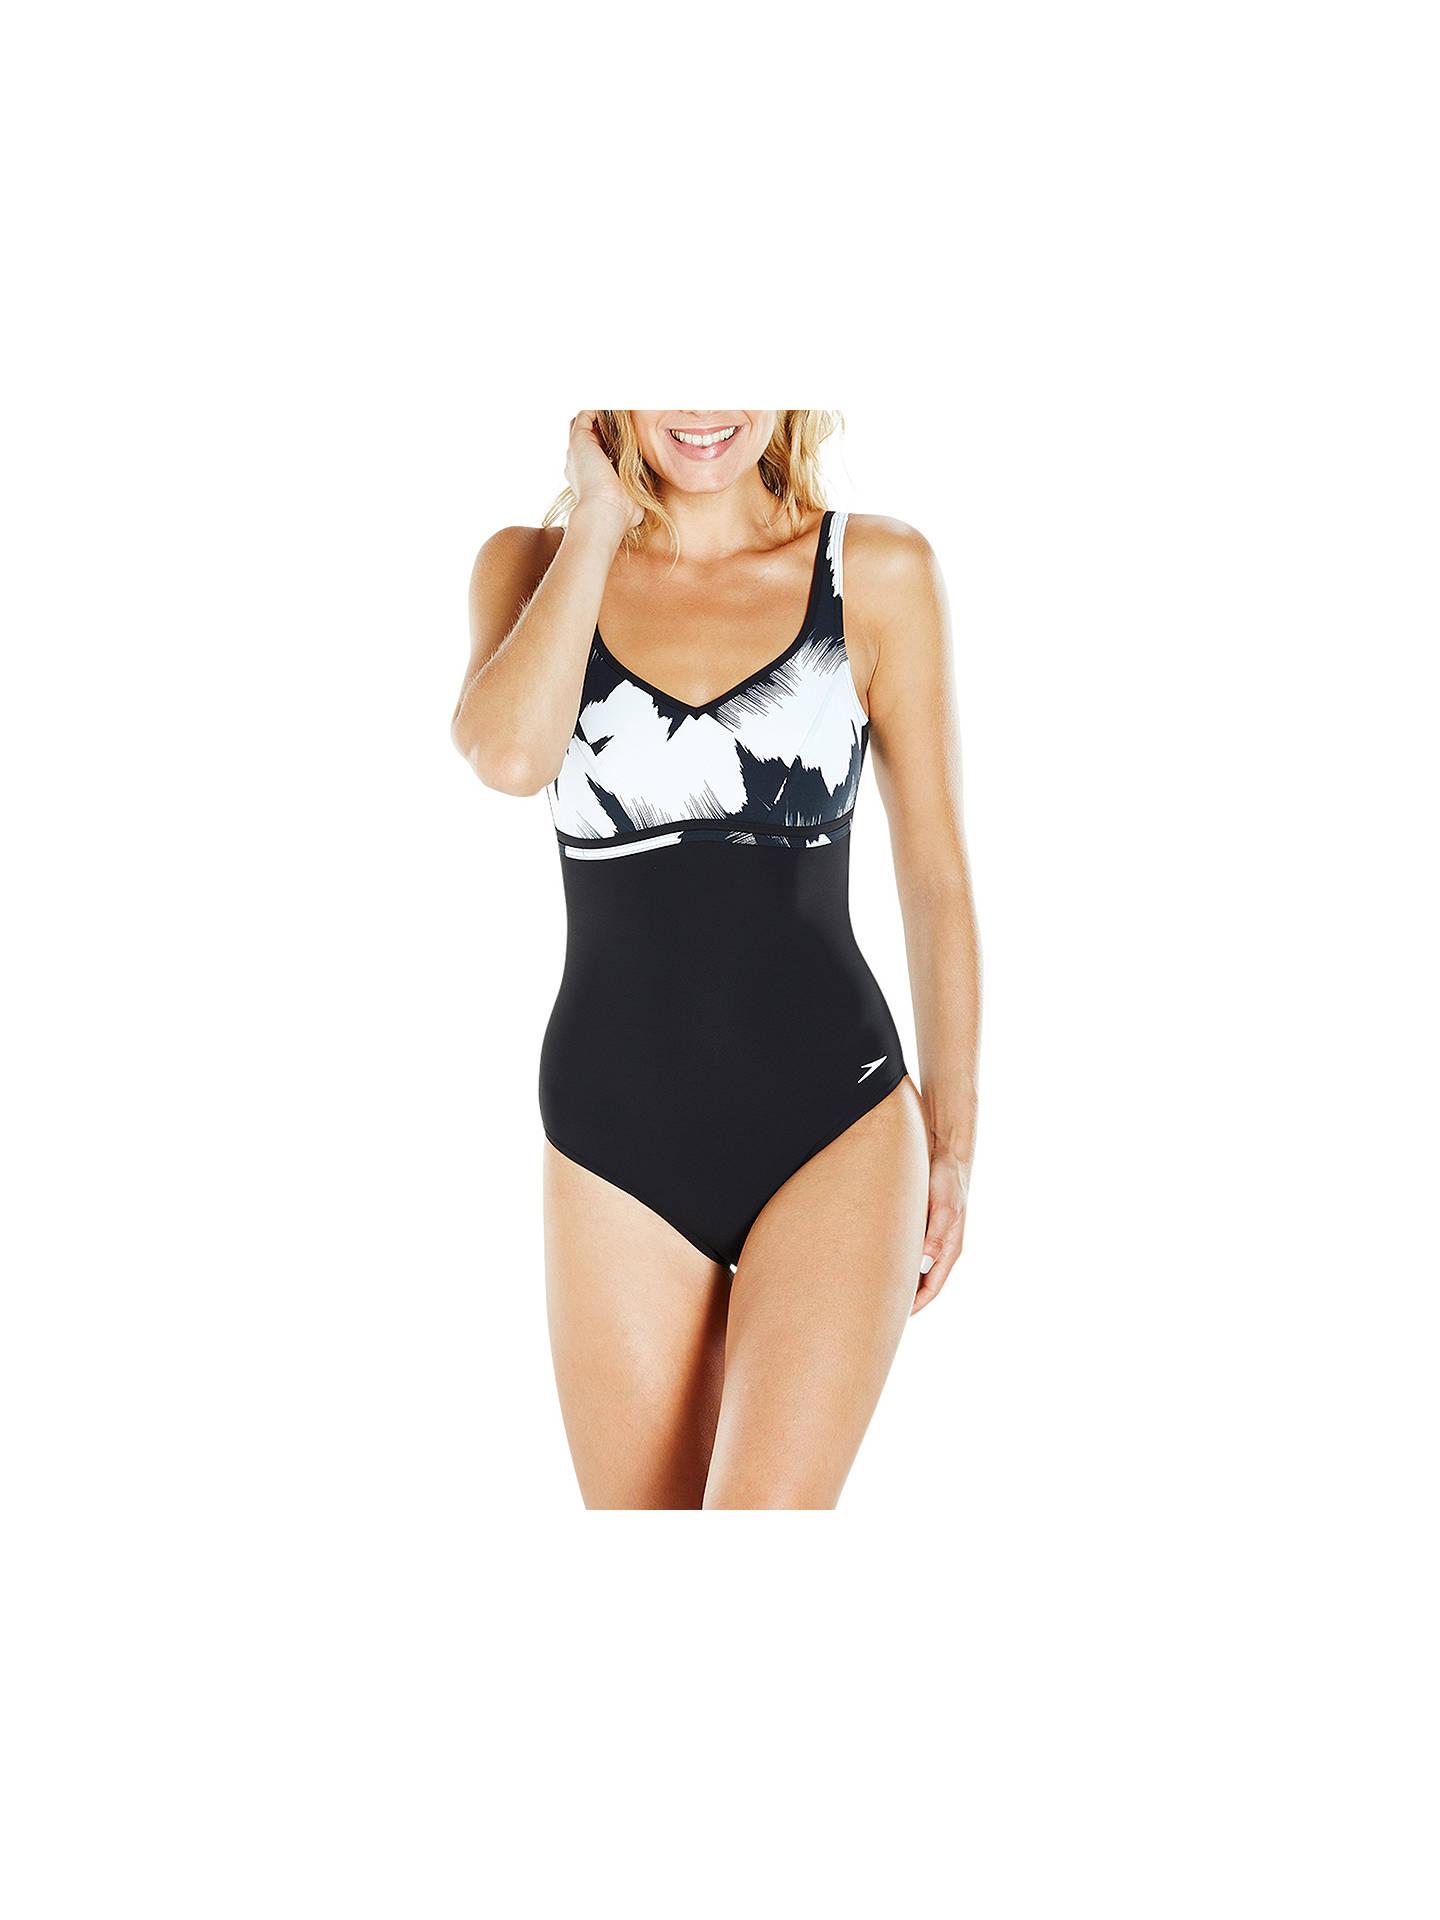 475b47e2790cb Buy Speedo Sculpture Contourluxe One Piece Swimsuit, Black/White, 32 Online  at johnlewis ...